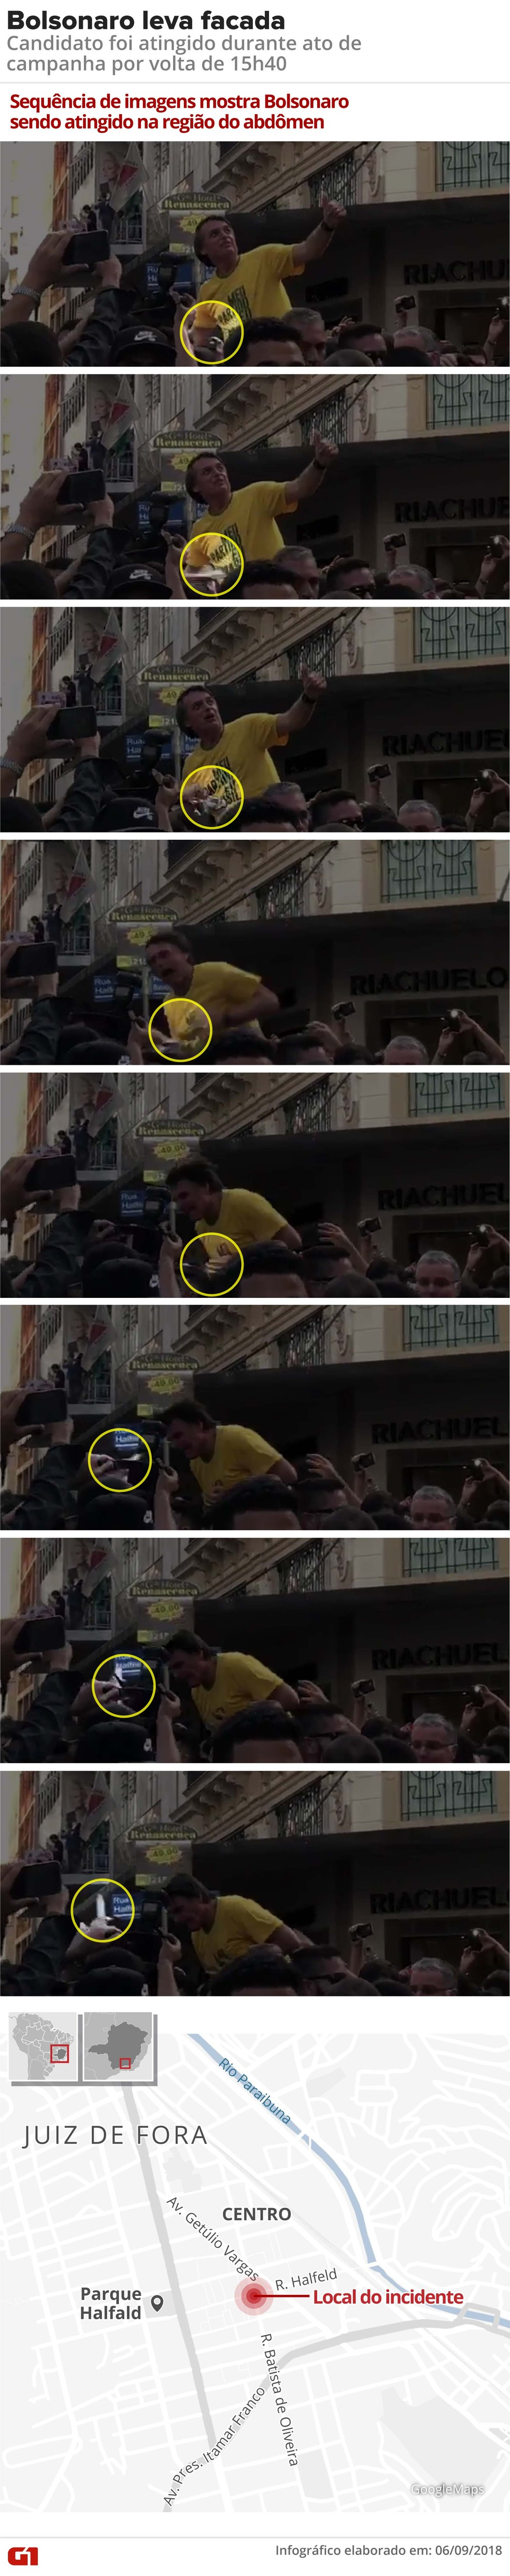 INFOGRÁFICO: Bolsonaro leva facada em Minas  (Foto: Roberta Jaworski e Alexandre Mauro/G1)